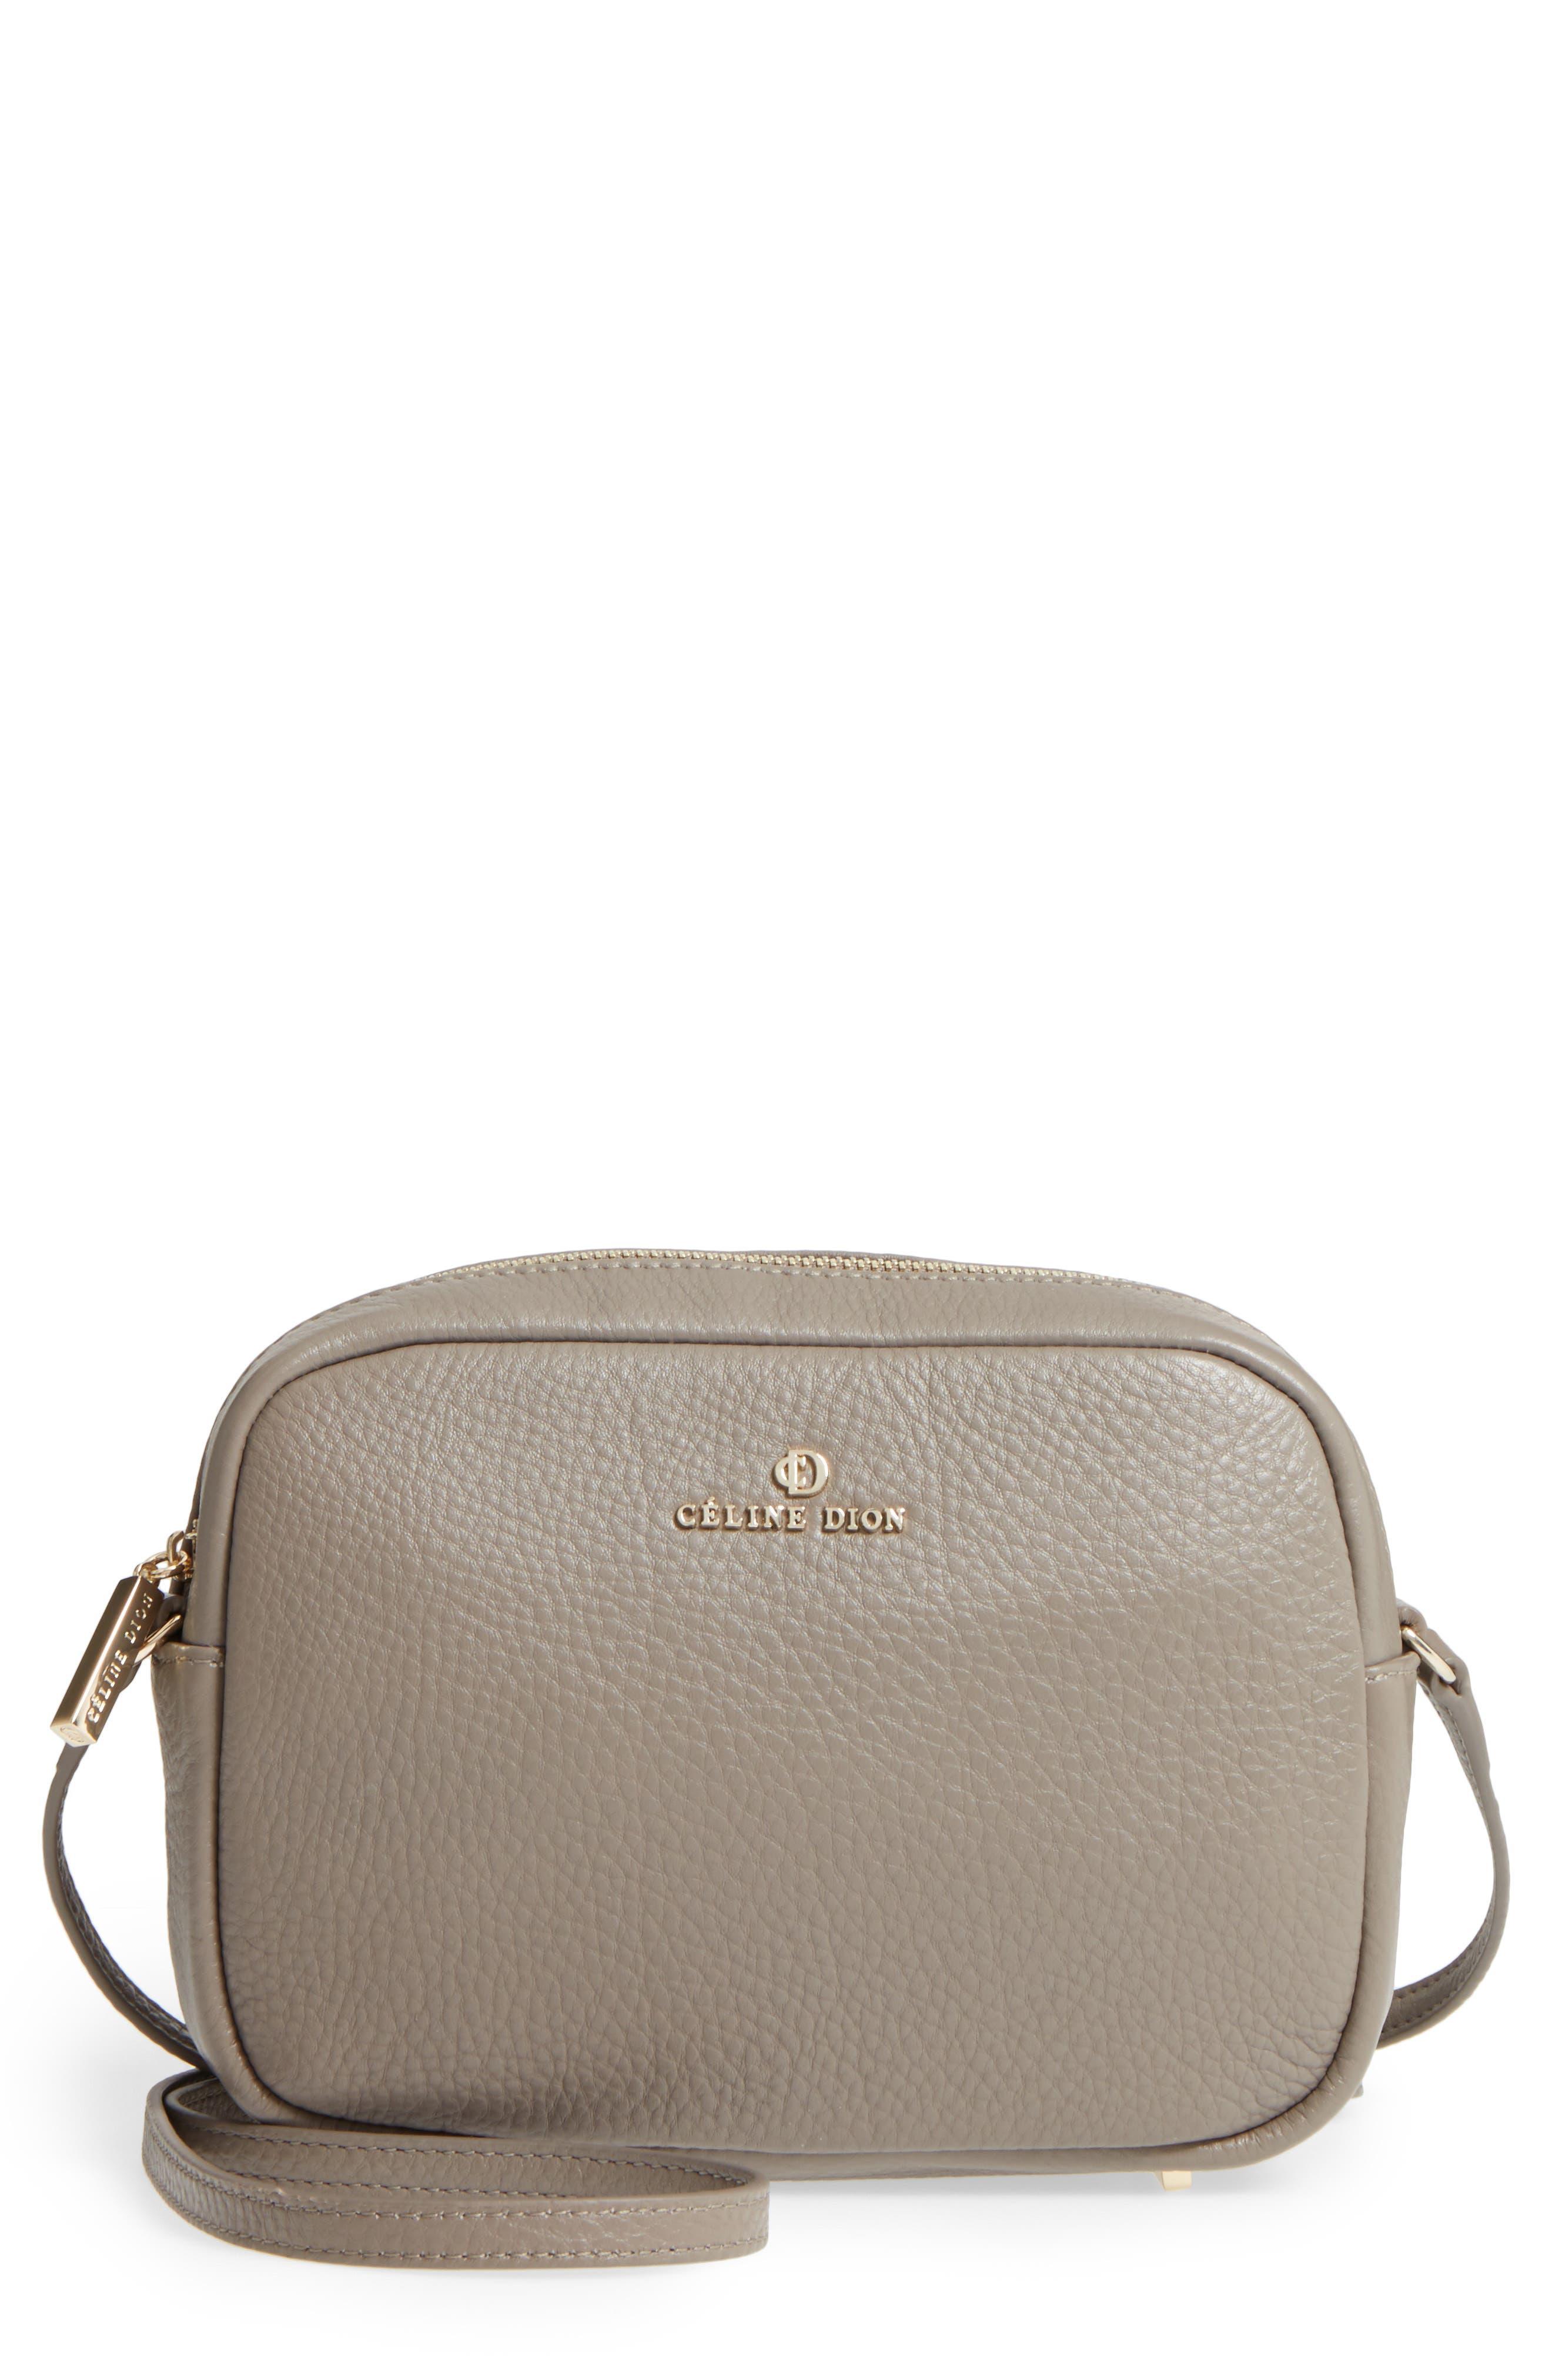 Main Image - Céline Dion Adagio Leather Camera Crossbody Bag